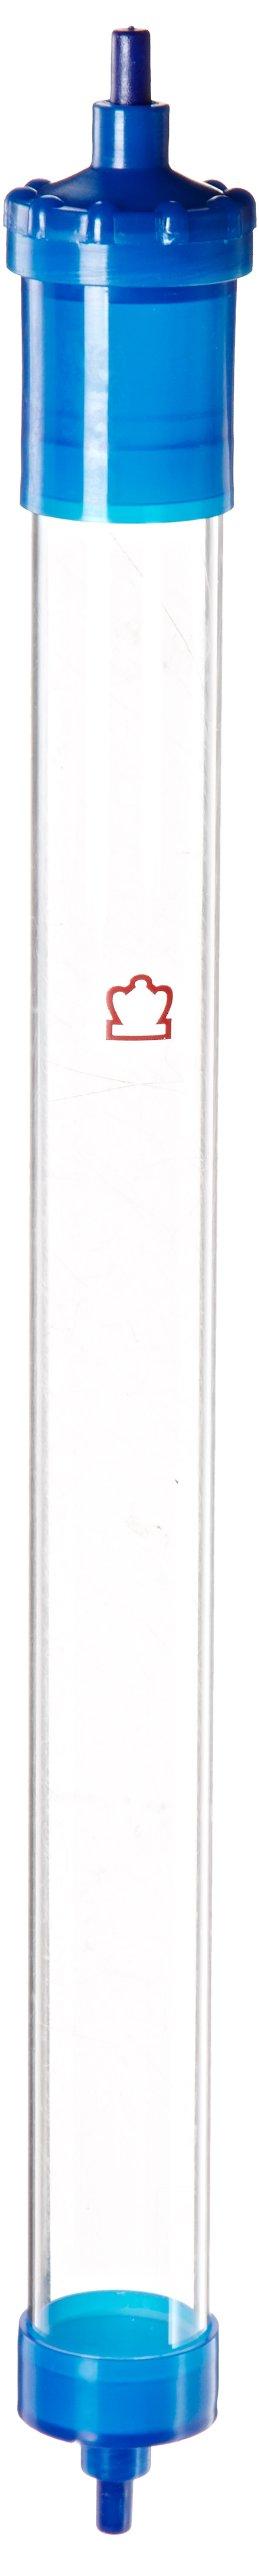 Kimble Flex-Column 420400-2530 Borosilicate Glass Economy Chromatography Columns, 147ml Volume, 2.5cm ID, 30cm Length, 4.91cm3 Cross Sectional Area (Case of 5)